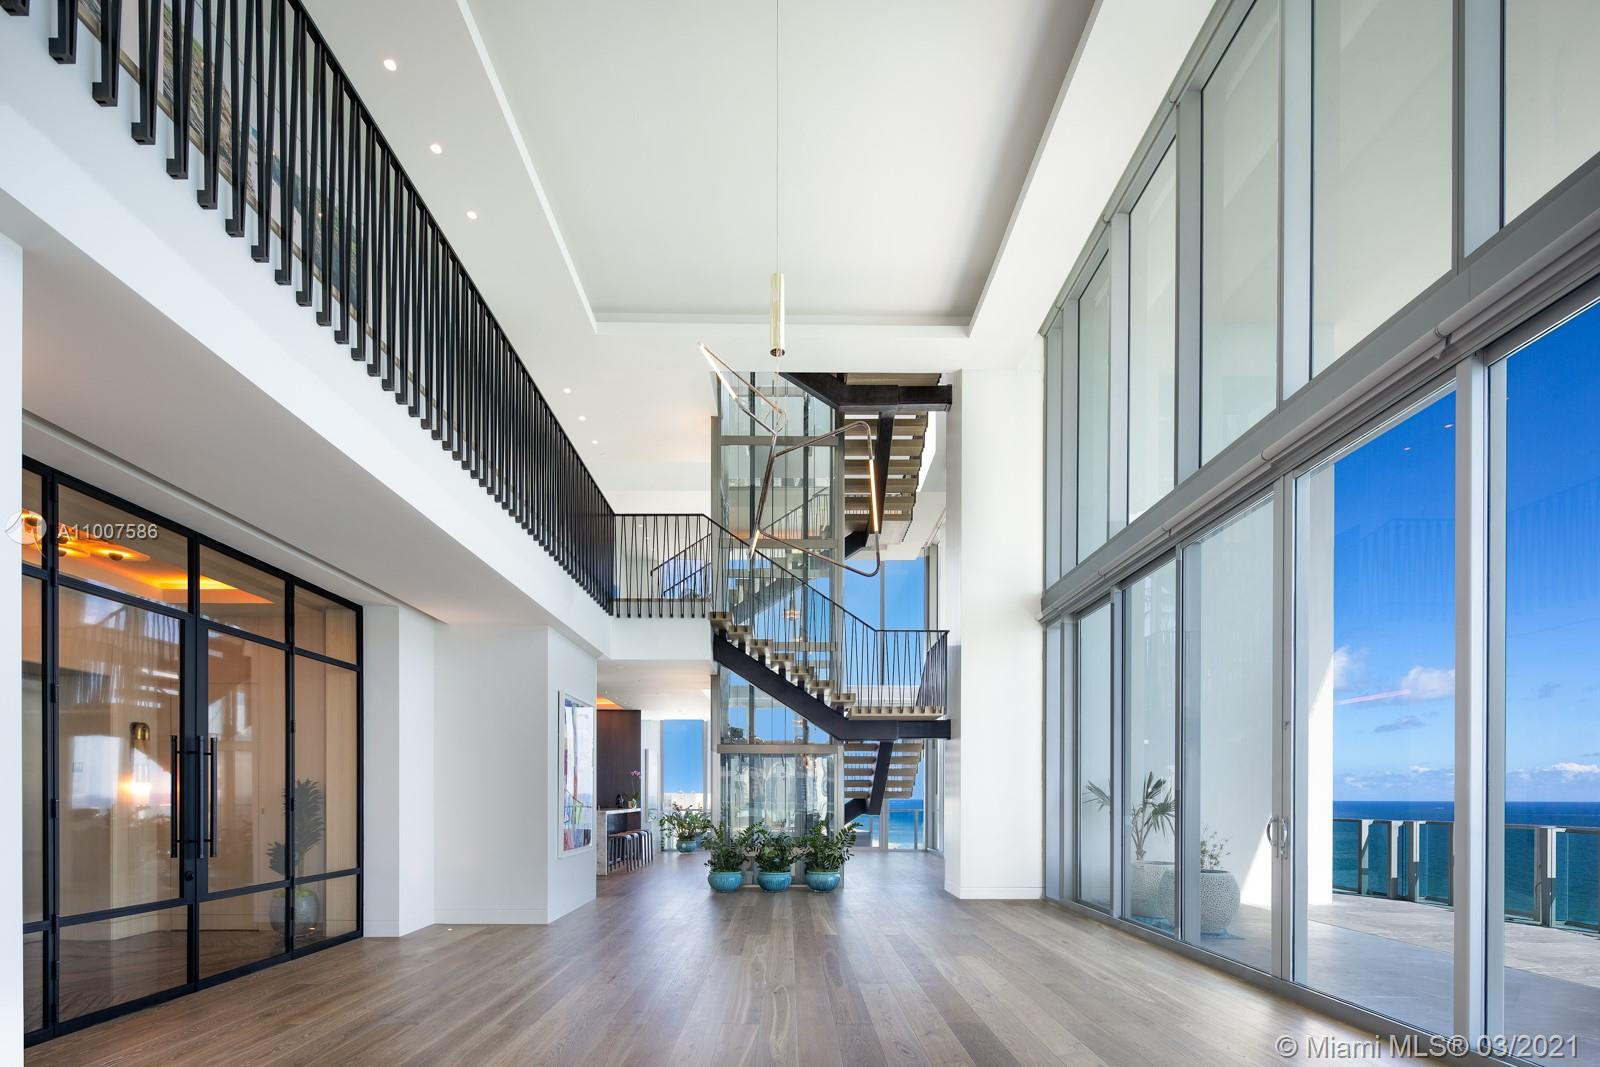 6901 Collins Ave, Unit #PH Luxury Real Estate